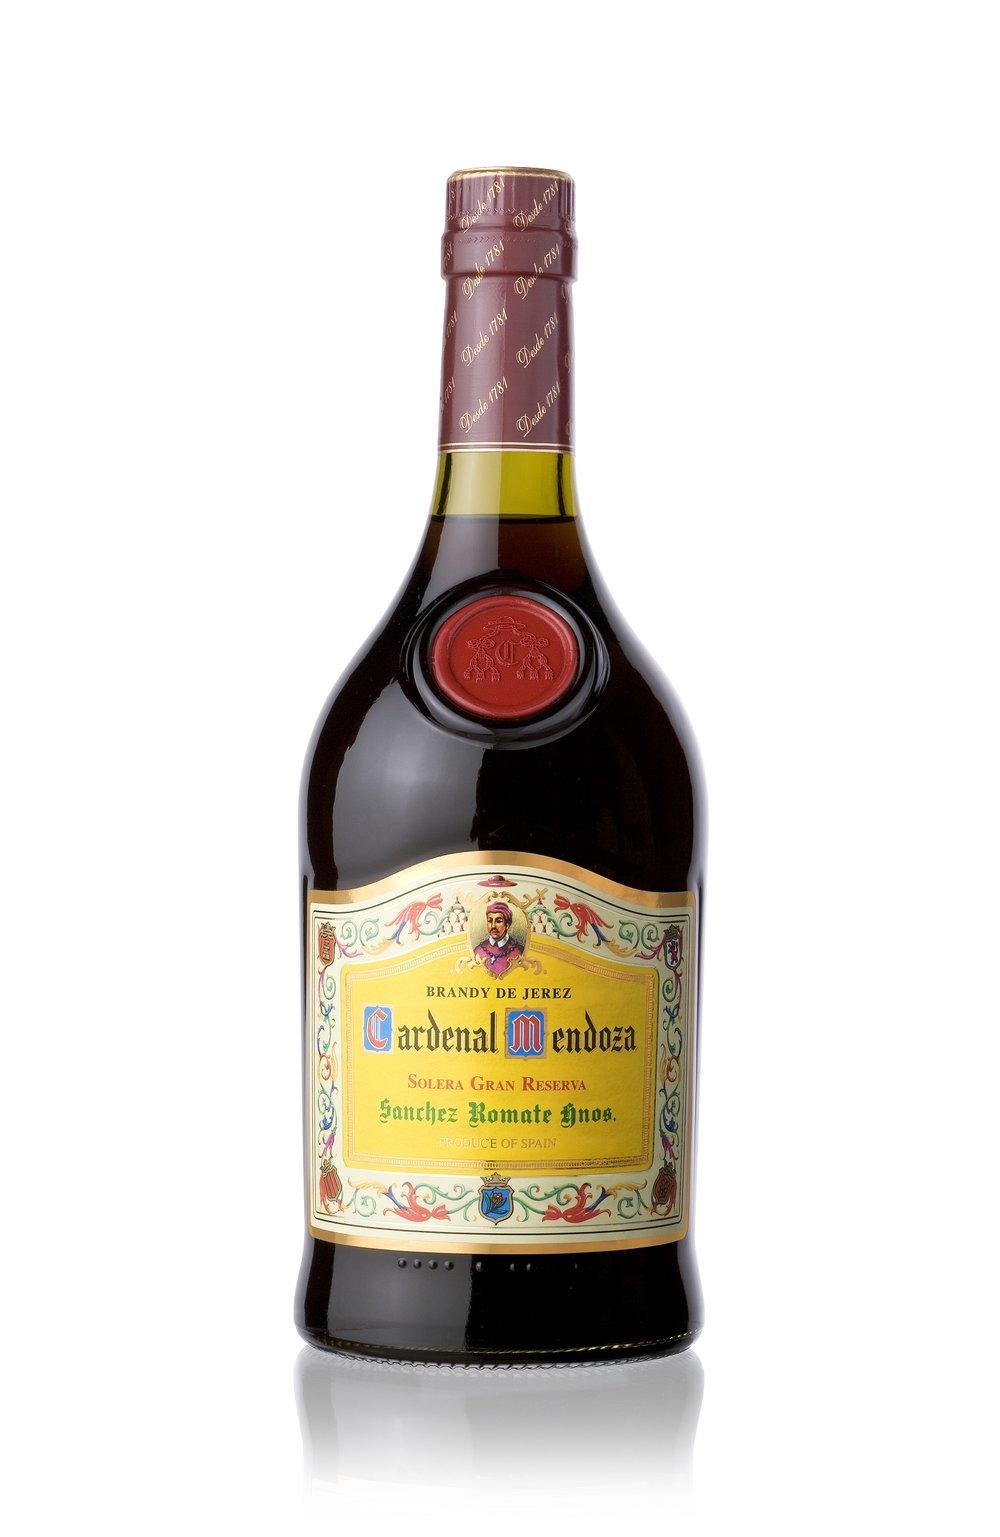 nu site_Brandy Cardenal Mendoza 0,70 litres.jpg